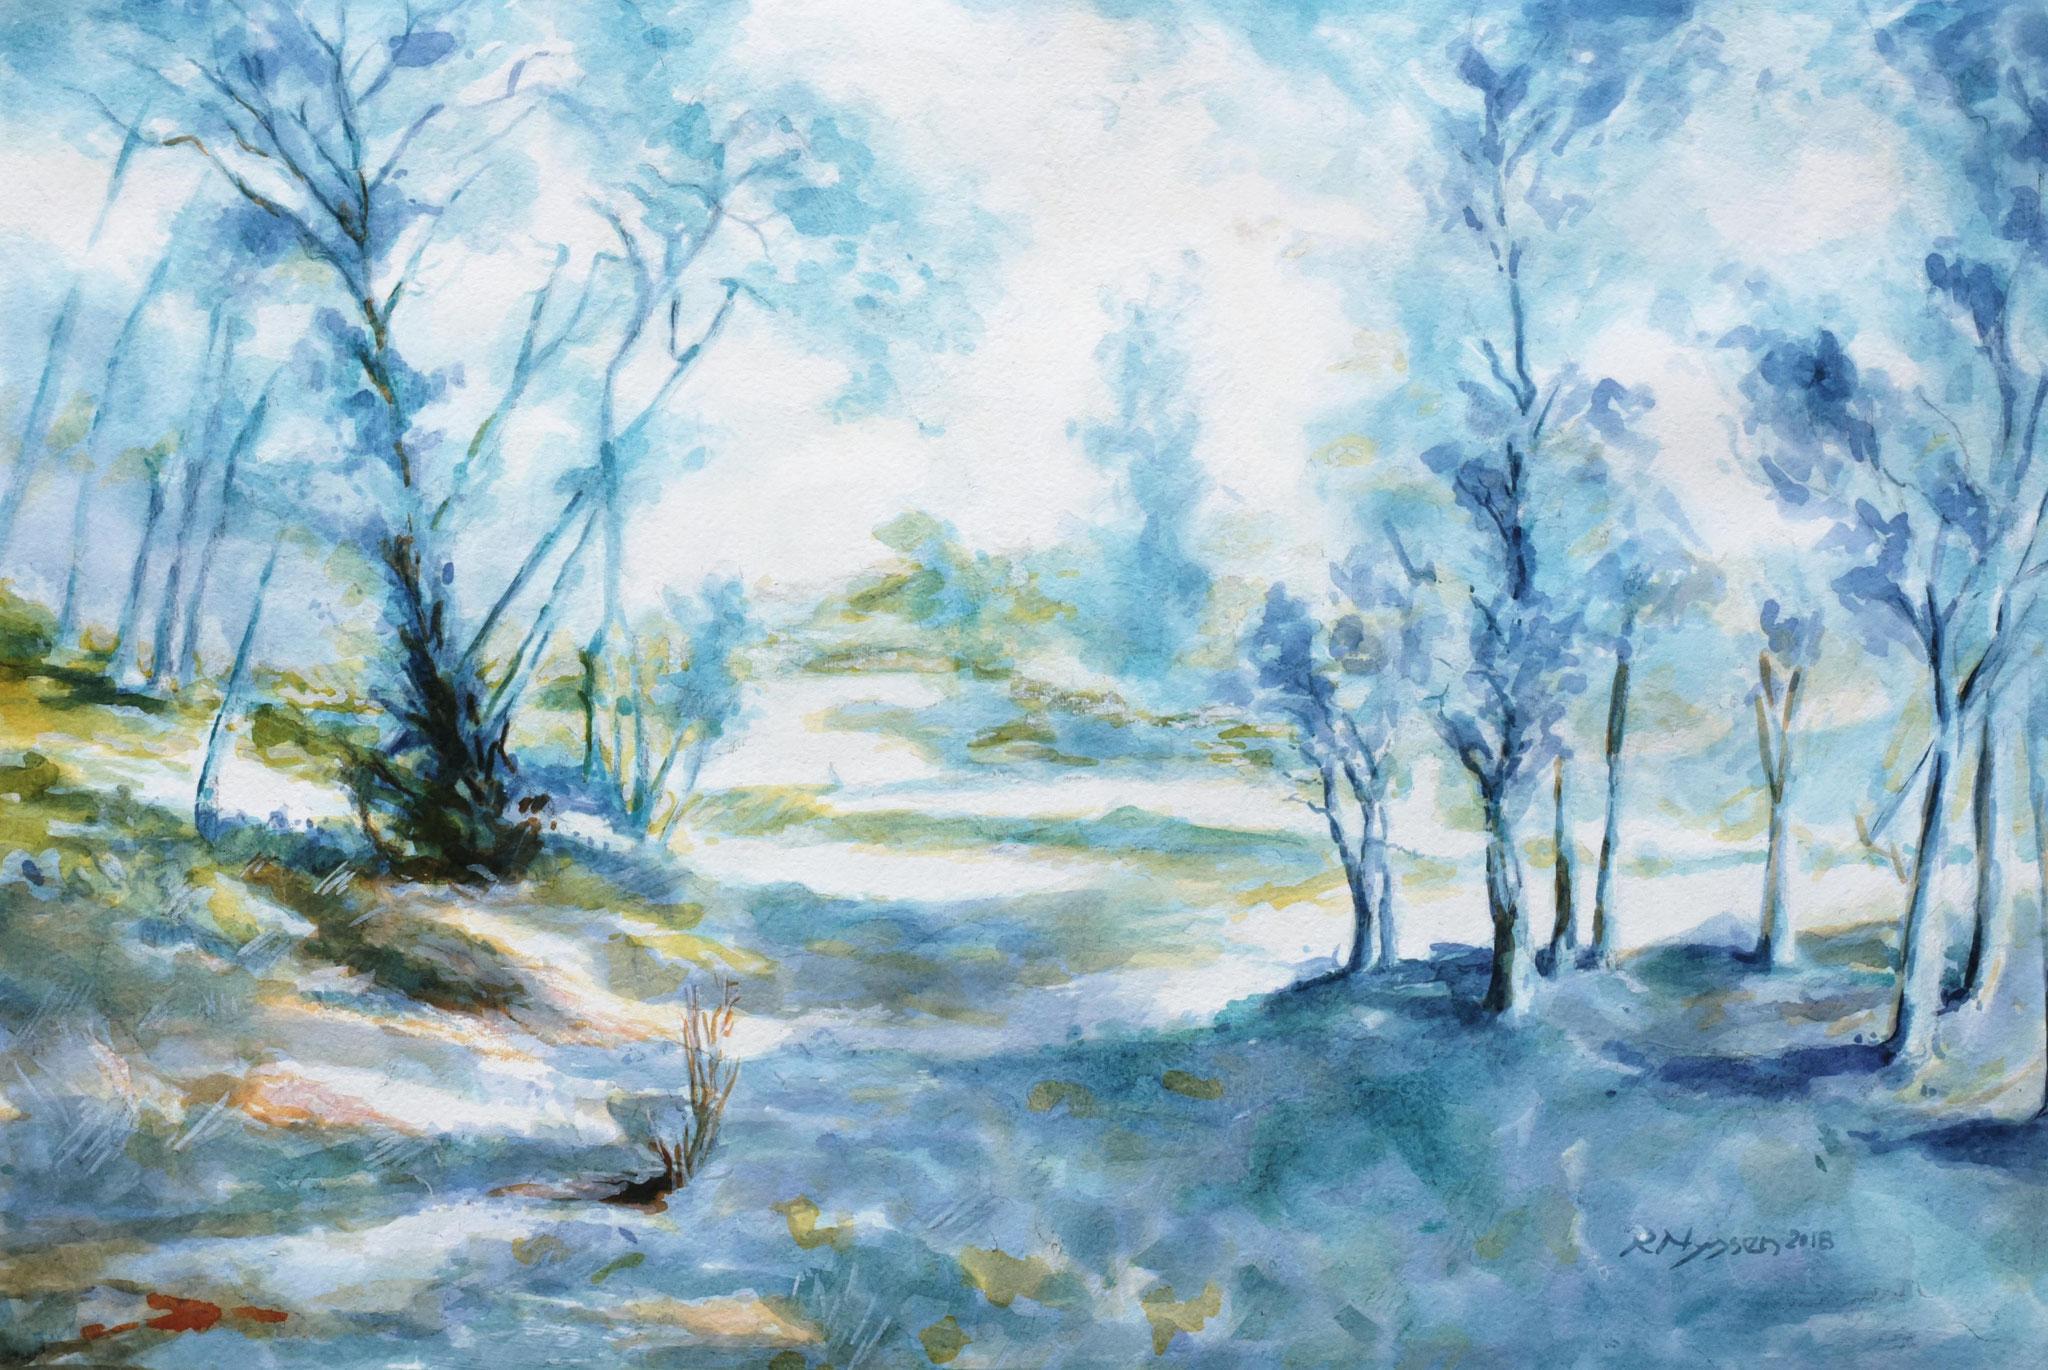 """Südliche Landschaft"", Aquarell, 50 * 34 cm / Southern scenery"